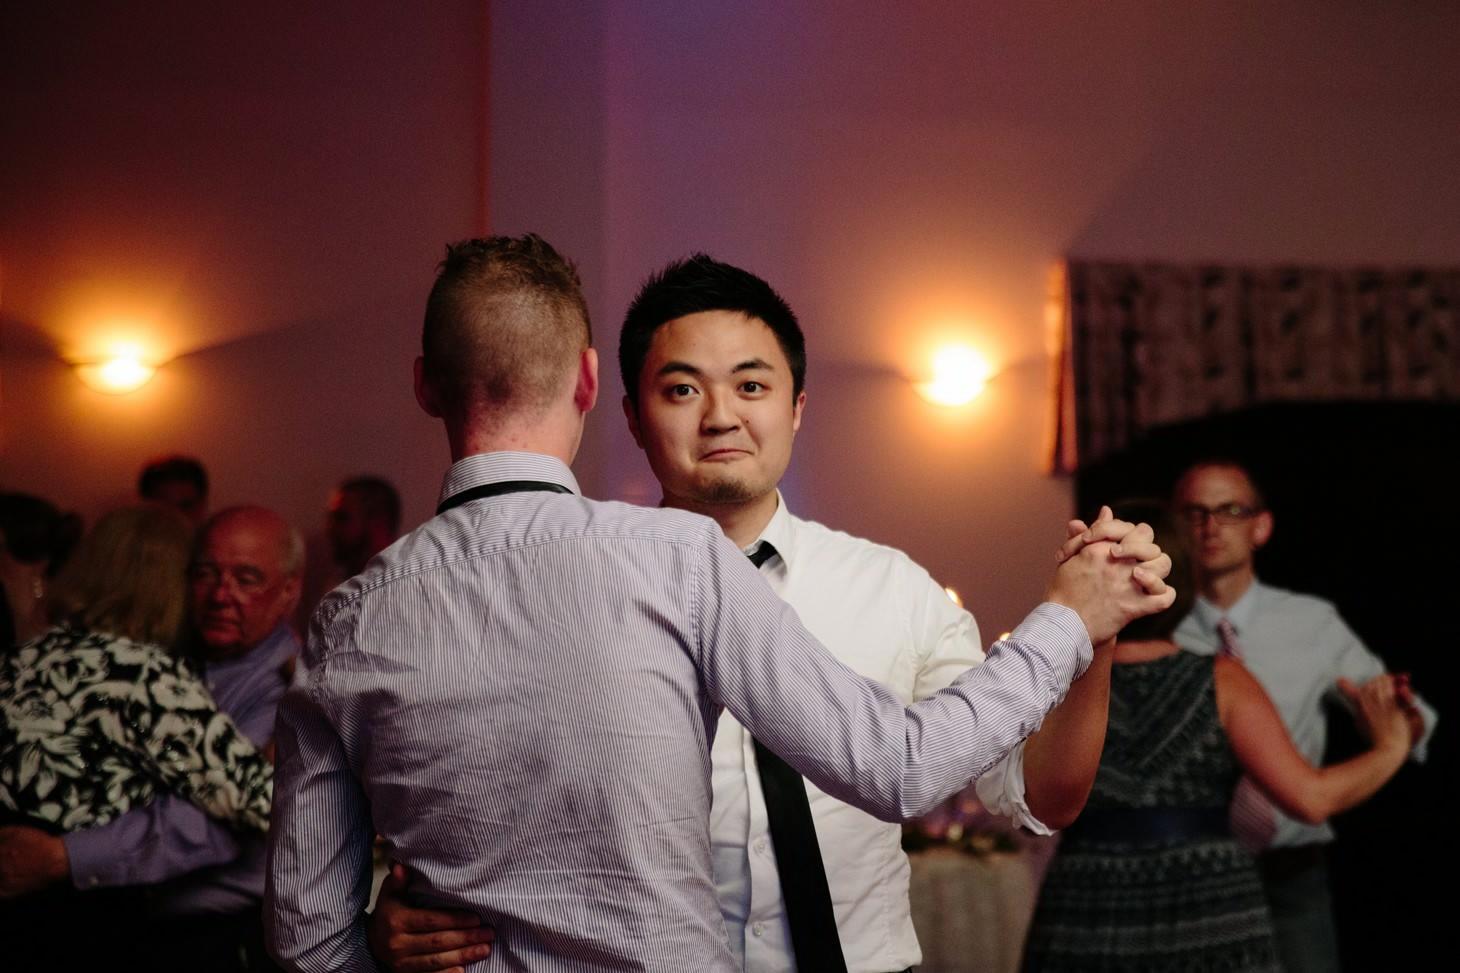 062-nyc-wedding-photographer-nj-nerdy-dr-who-firehouse-wedding-smitten-chickens.jpg